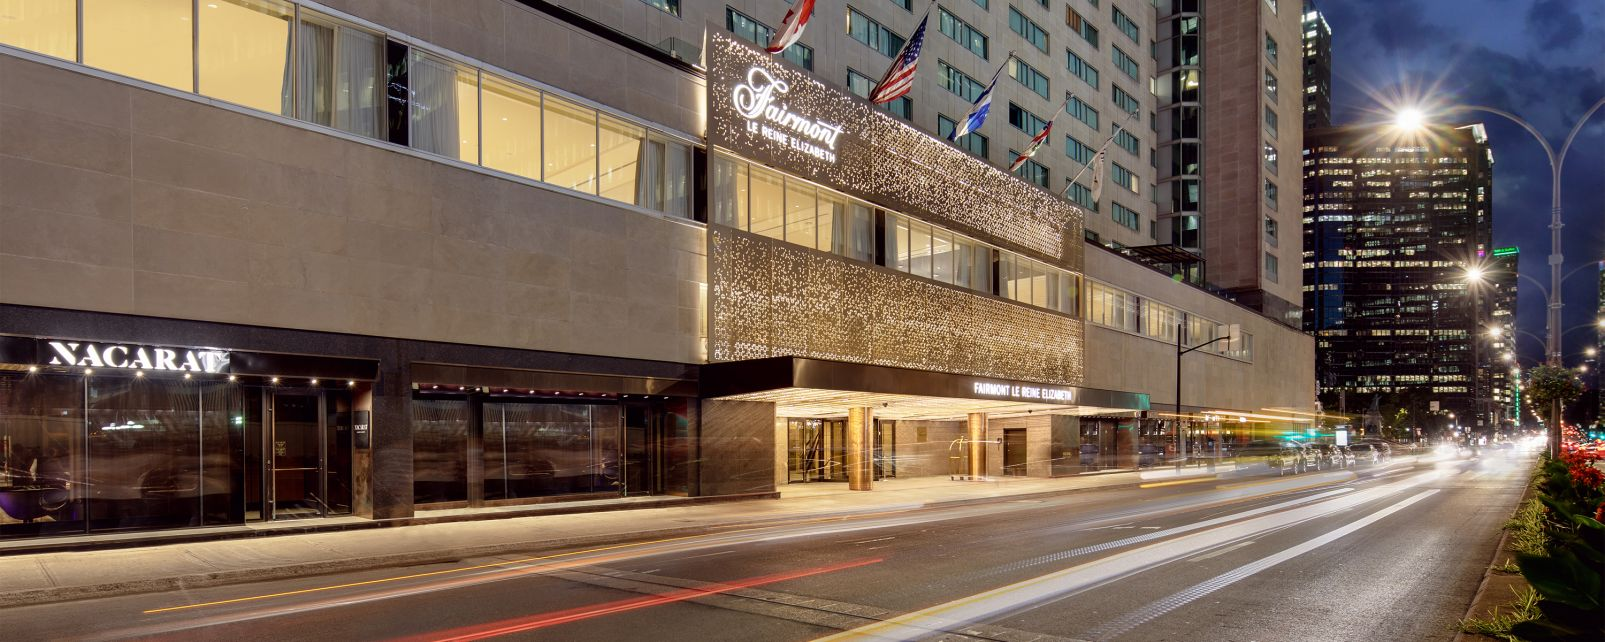 Hotel Fairmont Queen Elizabeth Hotel Montreal